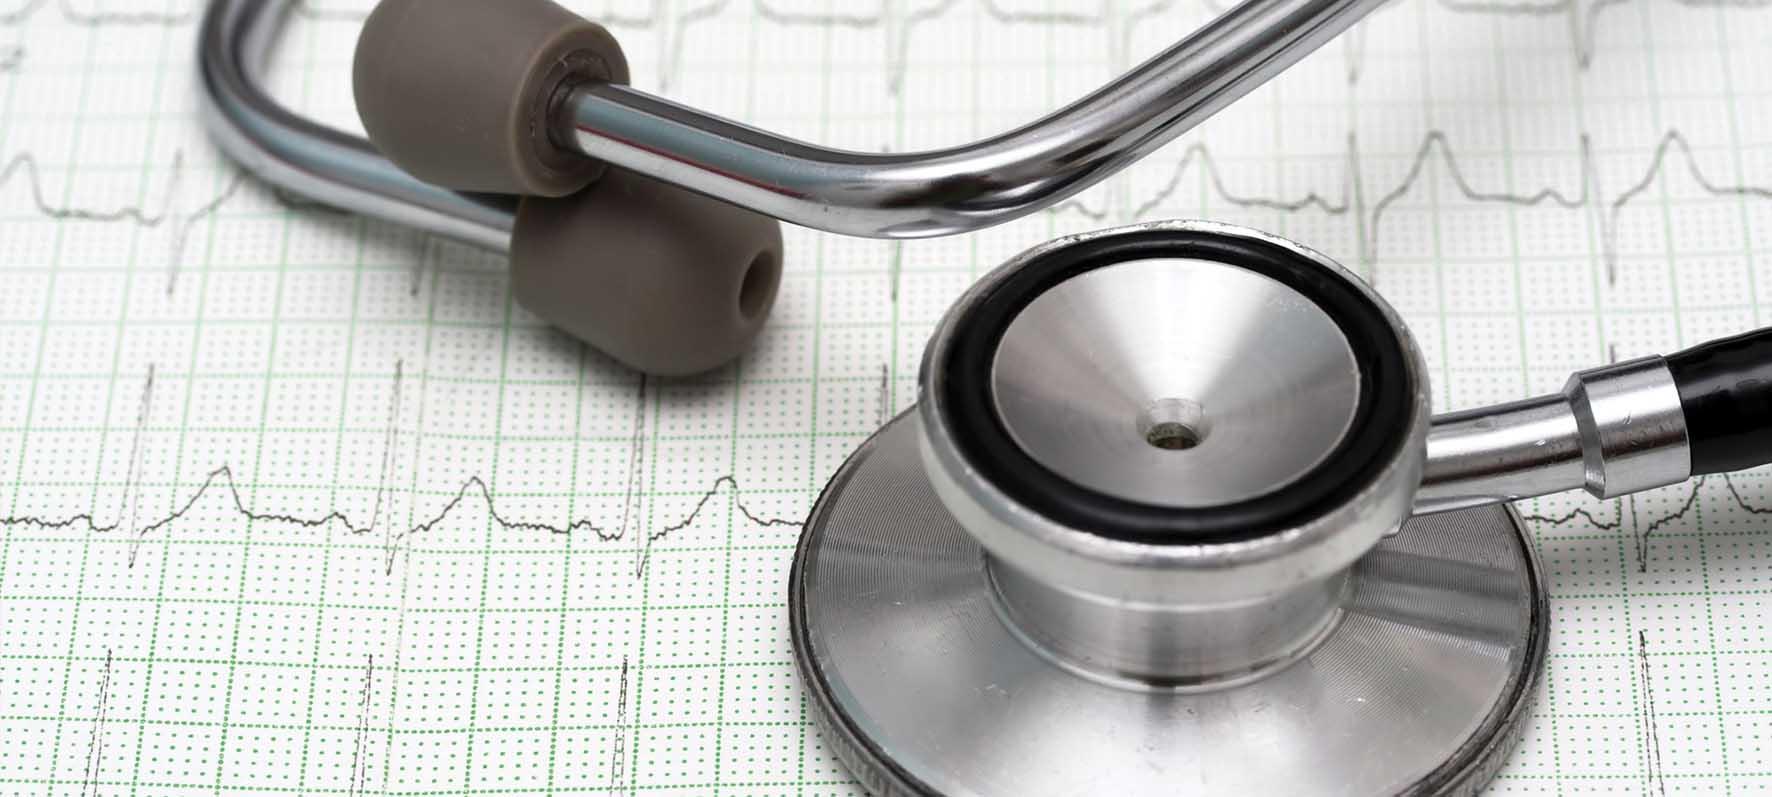 facoltà di medicina cardiologia medicina specialistica stetoscopio cadiogramma